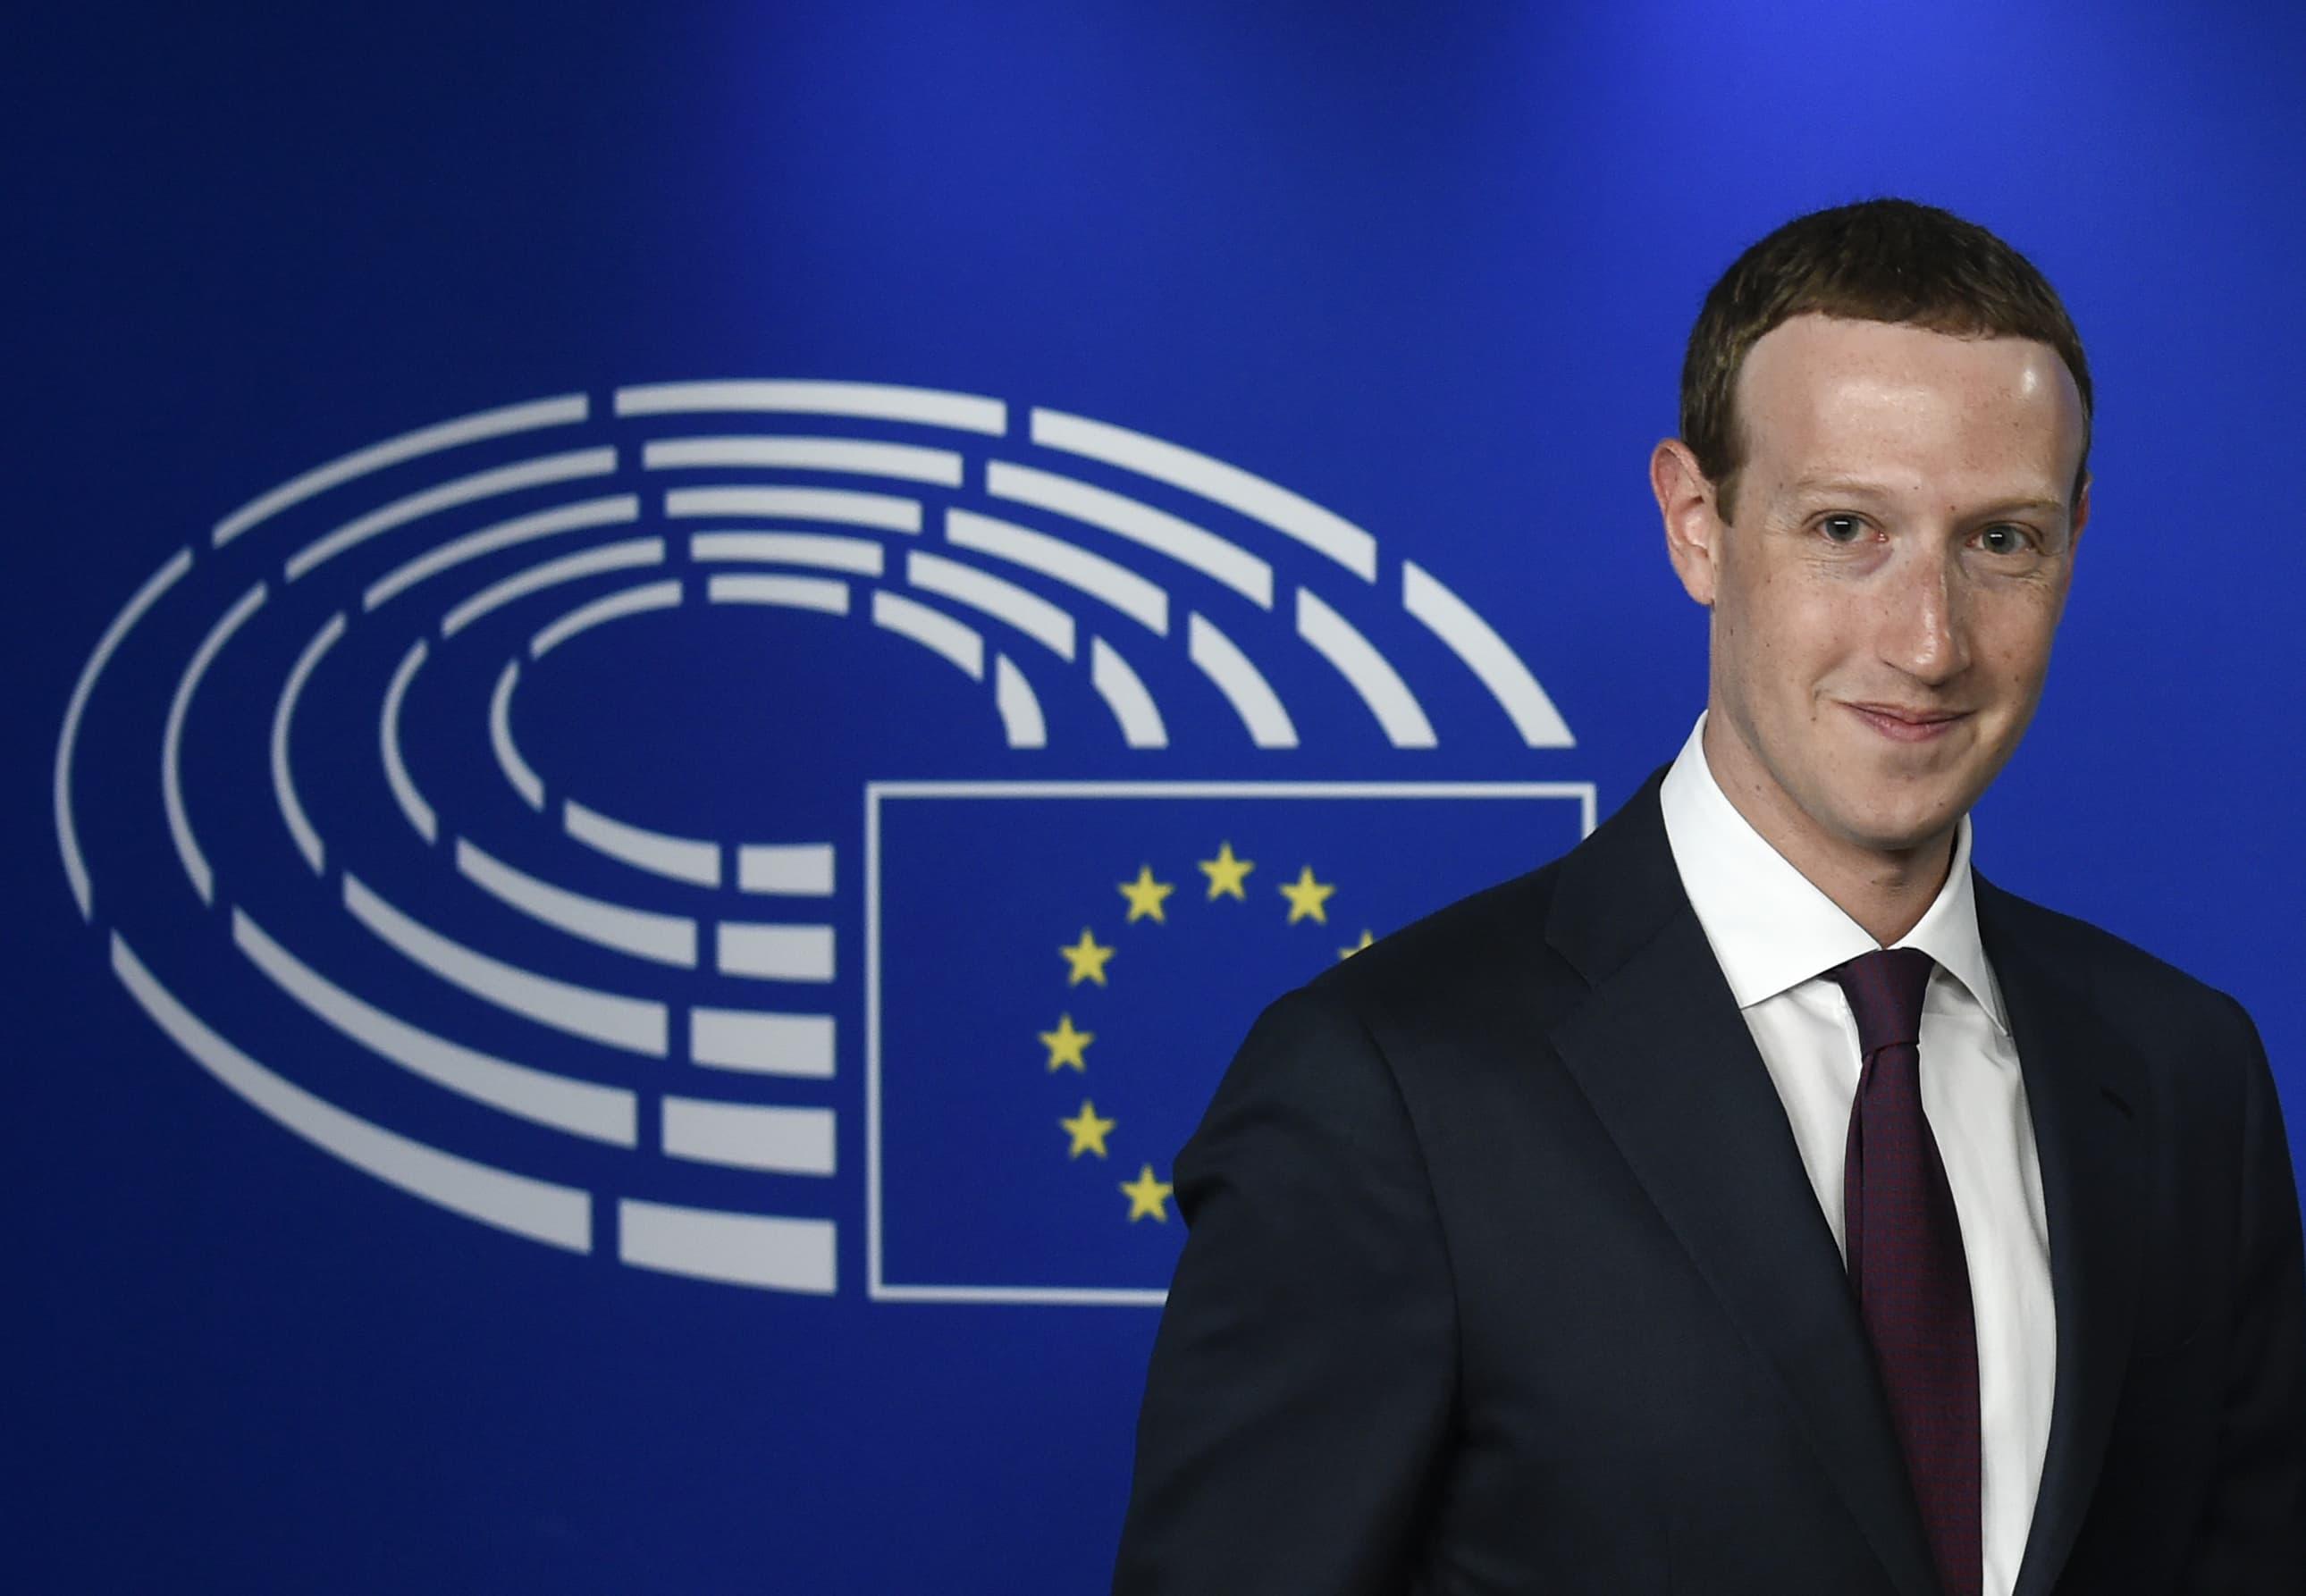 Premium: Mark Zuckerberg EU Parliament 180522-003